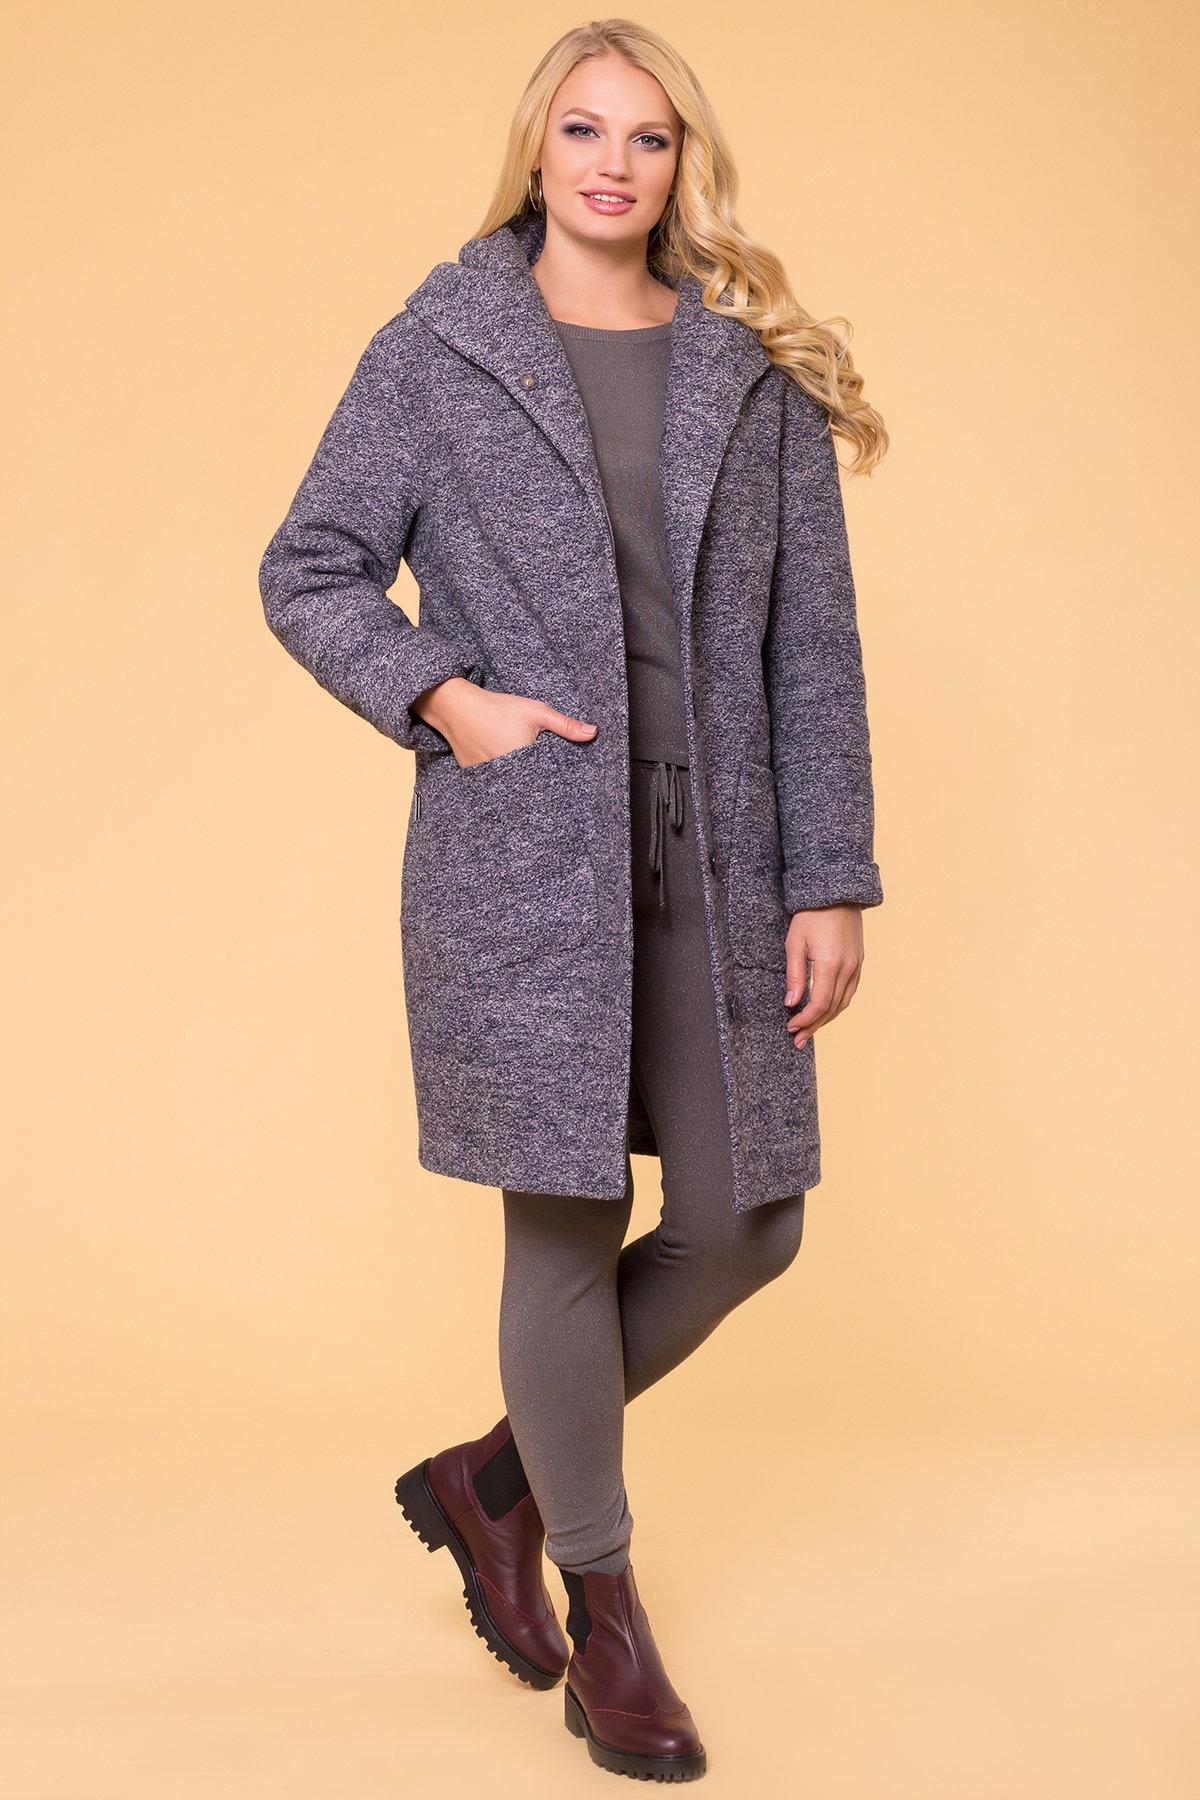 Пальто зима Анита Donna 3720 Цвет: Серый 22